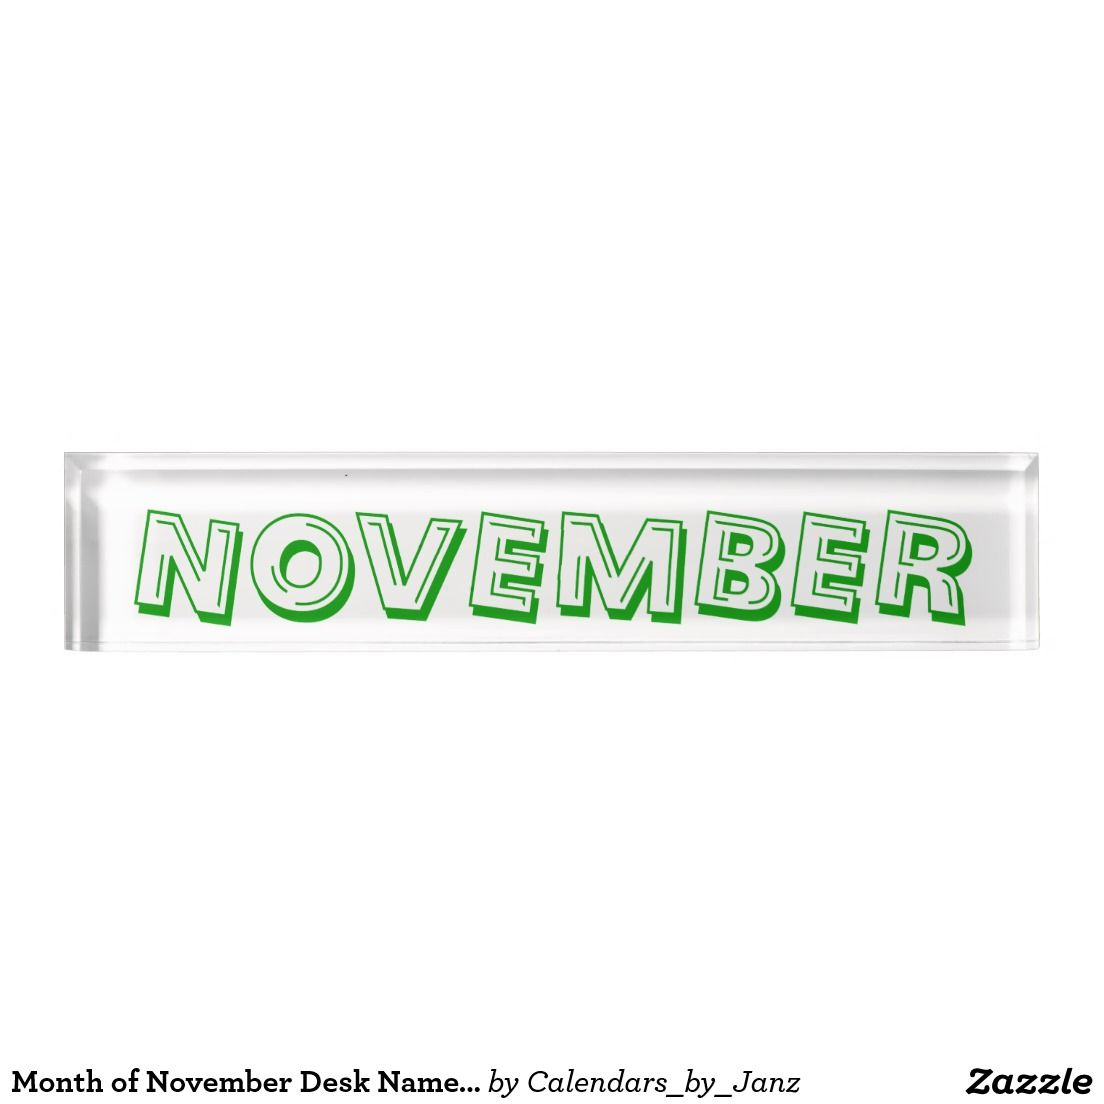 Month of November Desk Nameplate by Janz